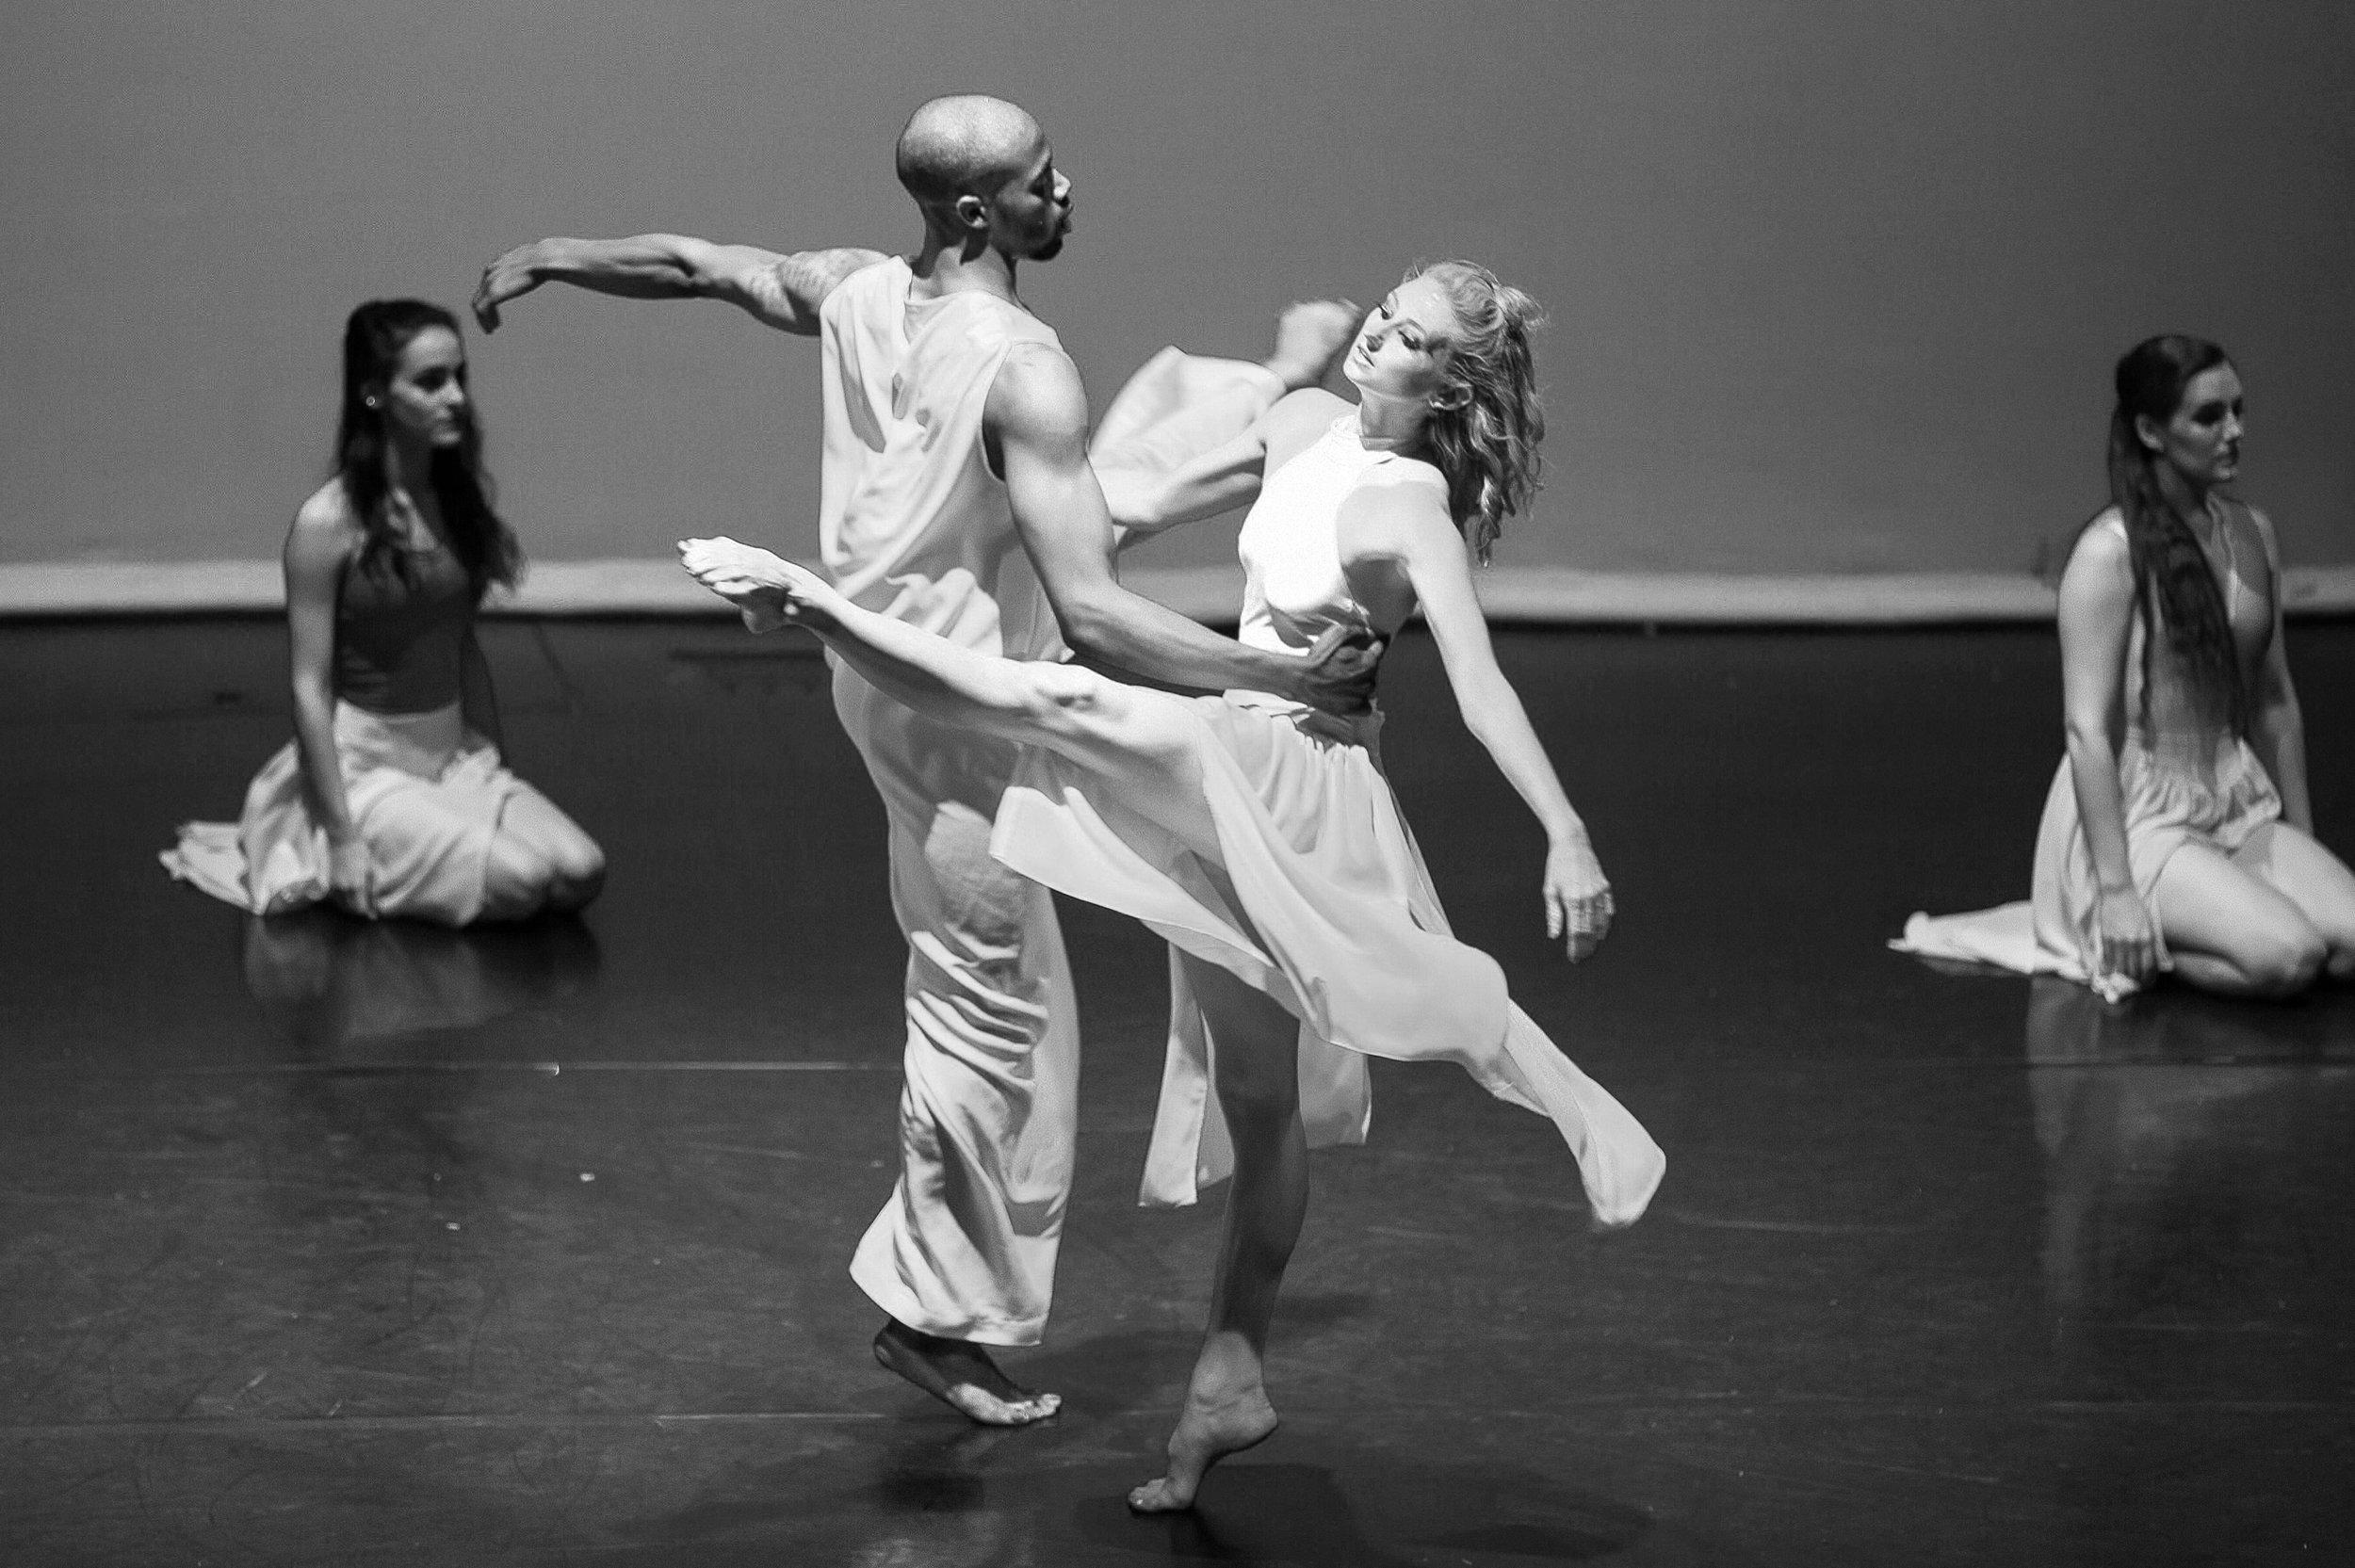 Dancers: Caleaf Henson & Sarah Brower